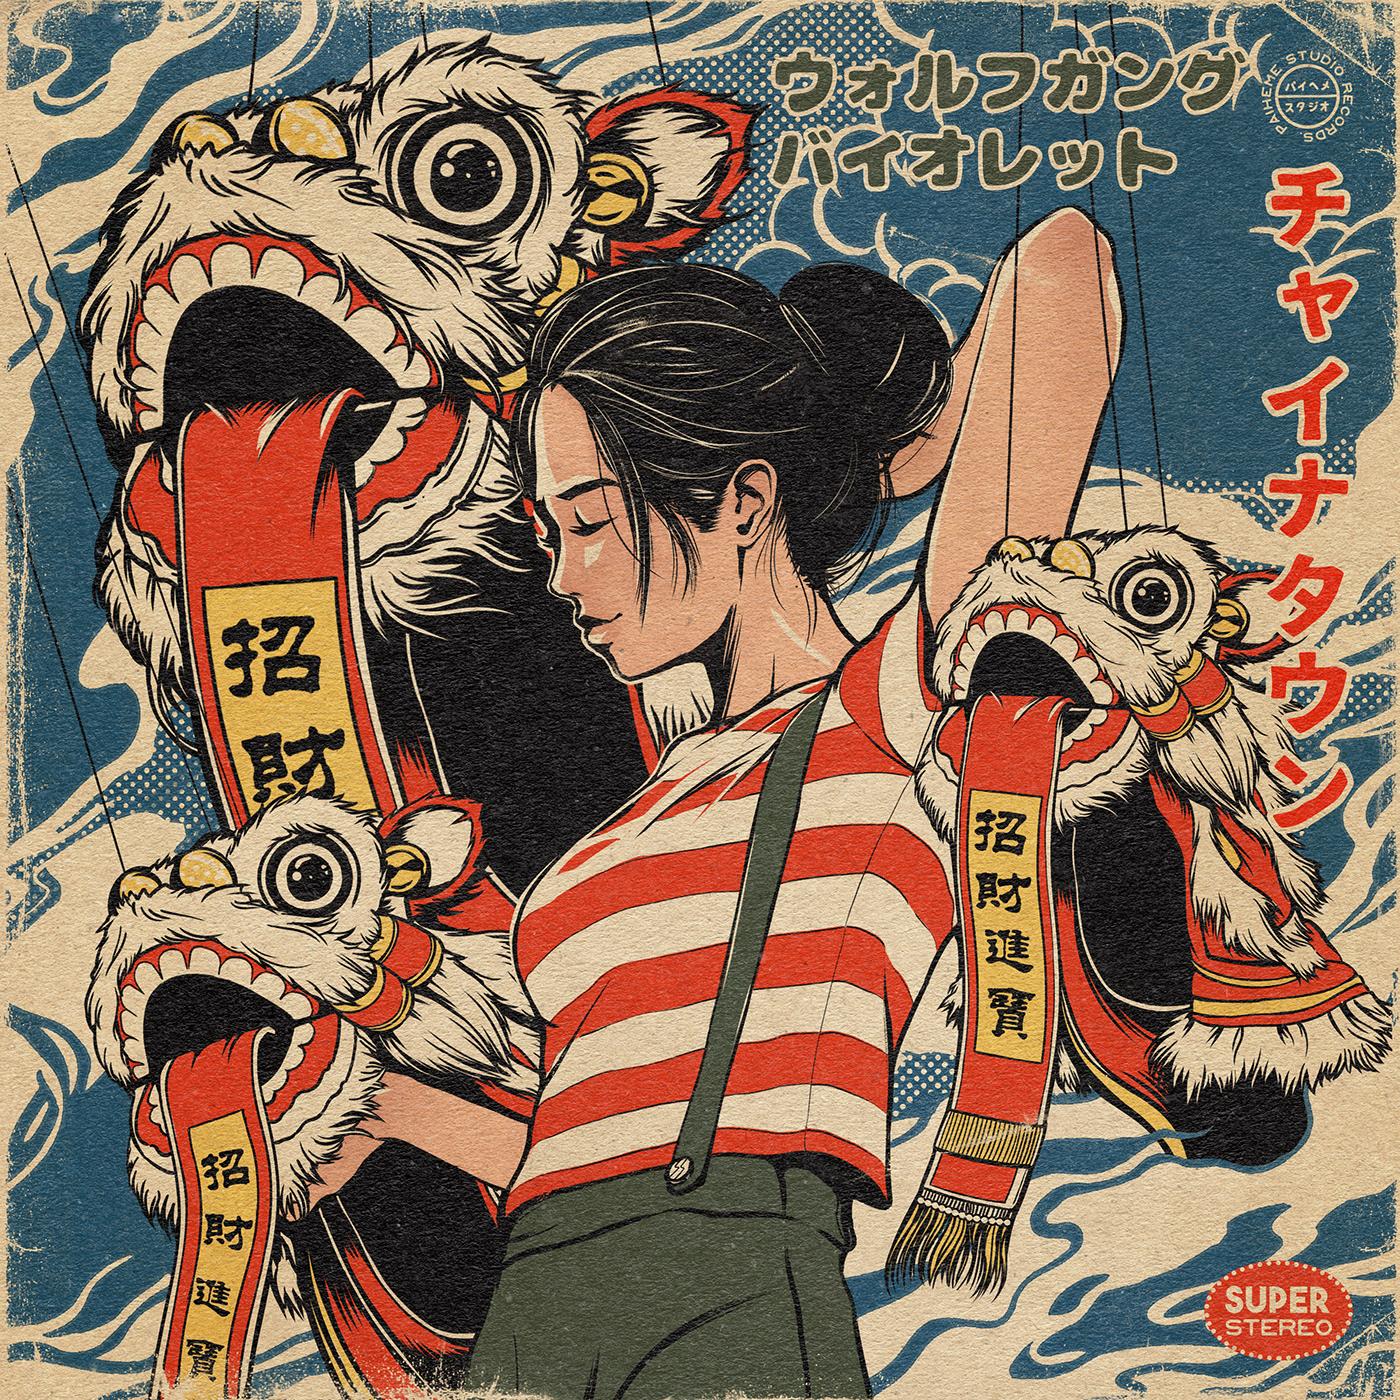 Album vinyl cover japanese chinatown paiheme paiheme studio vintage Retro chinese